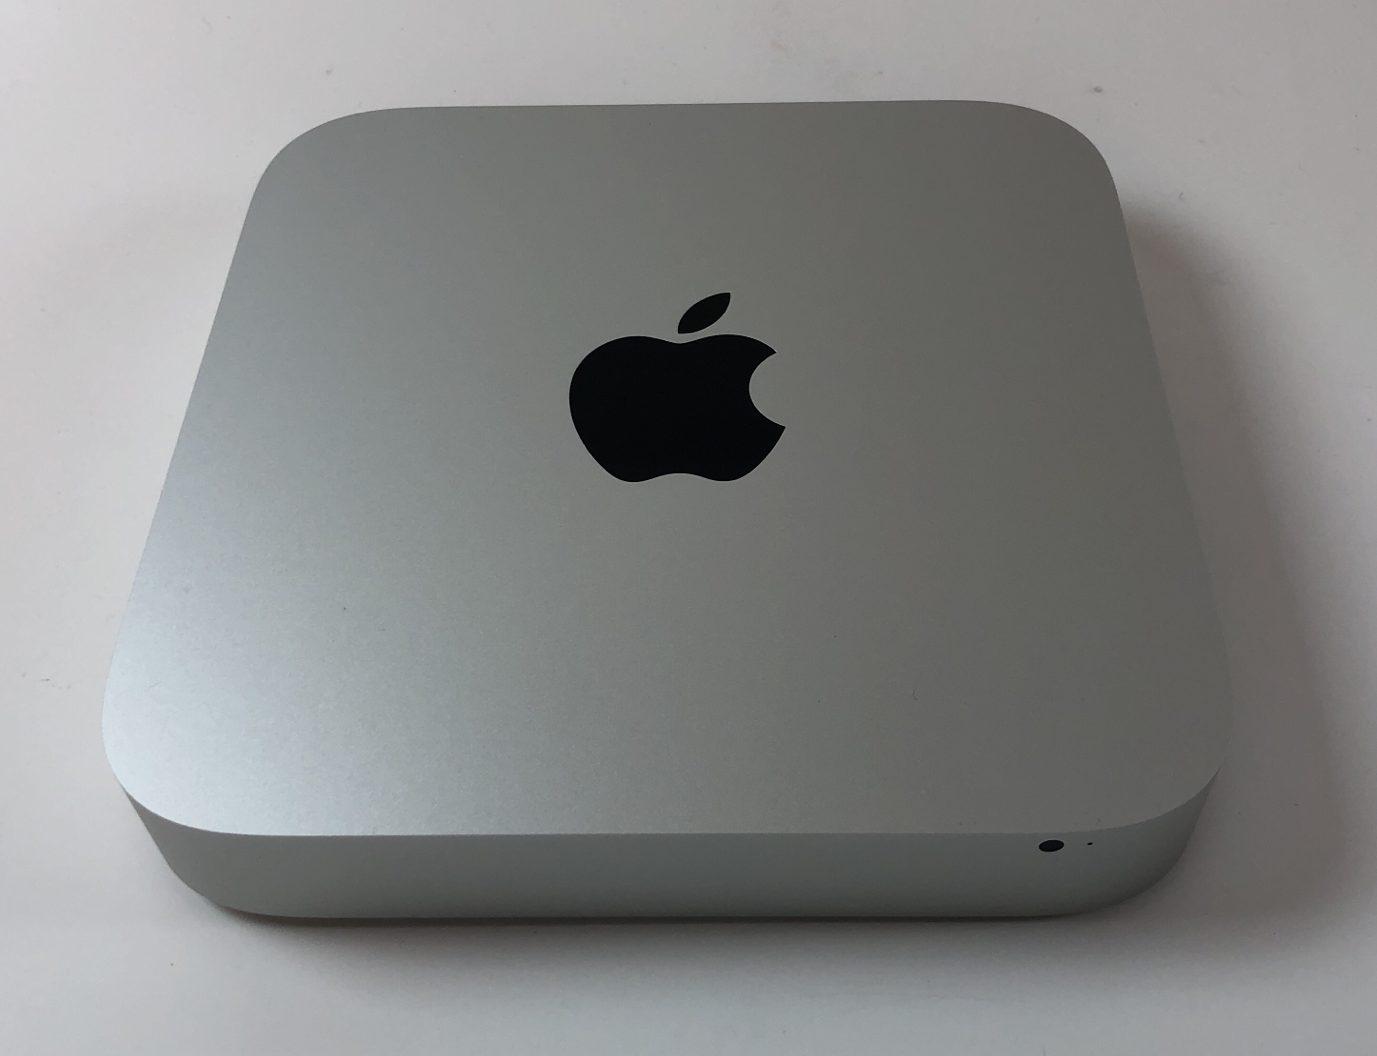 Mac Mini Late 2014 (Intel Core i5 2.6 GHz 8 GB RAM 1 TB Fusion Drive), Intel Core i5 2.6 GHz, 8 GB RAM, 1 TB Fusion Drive, Kuva 1